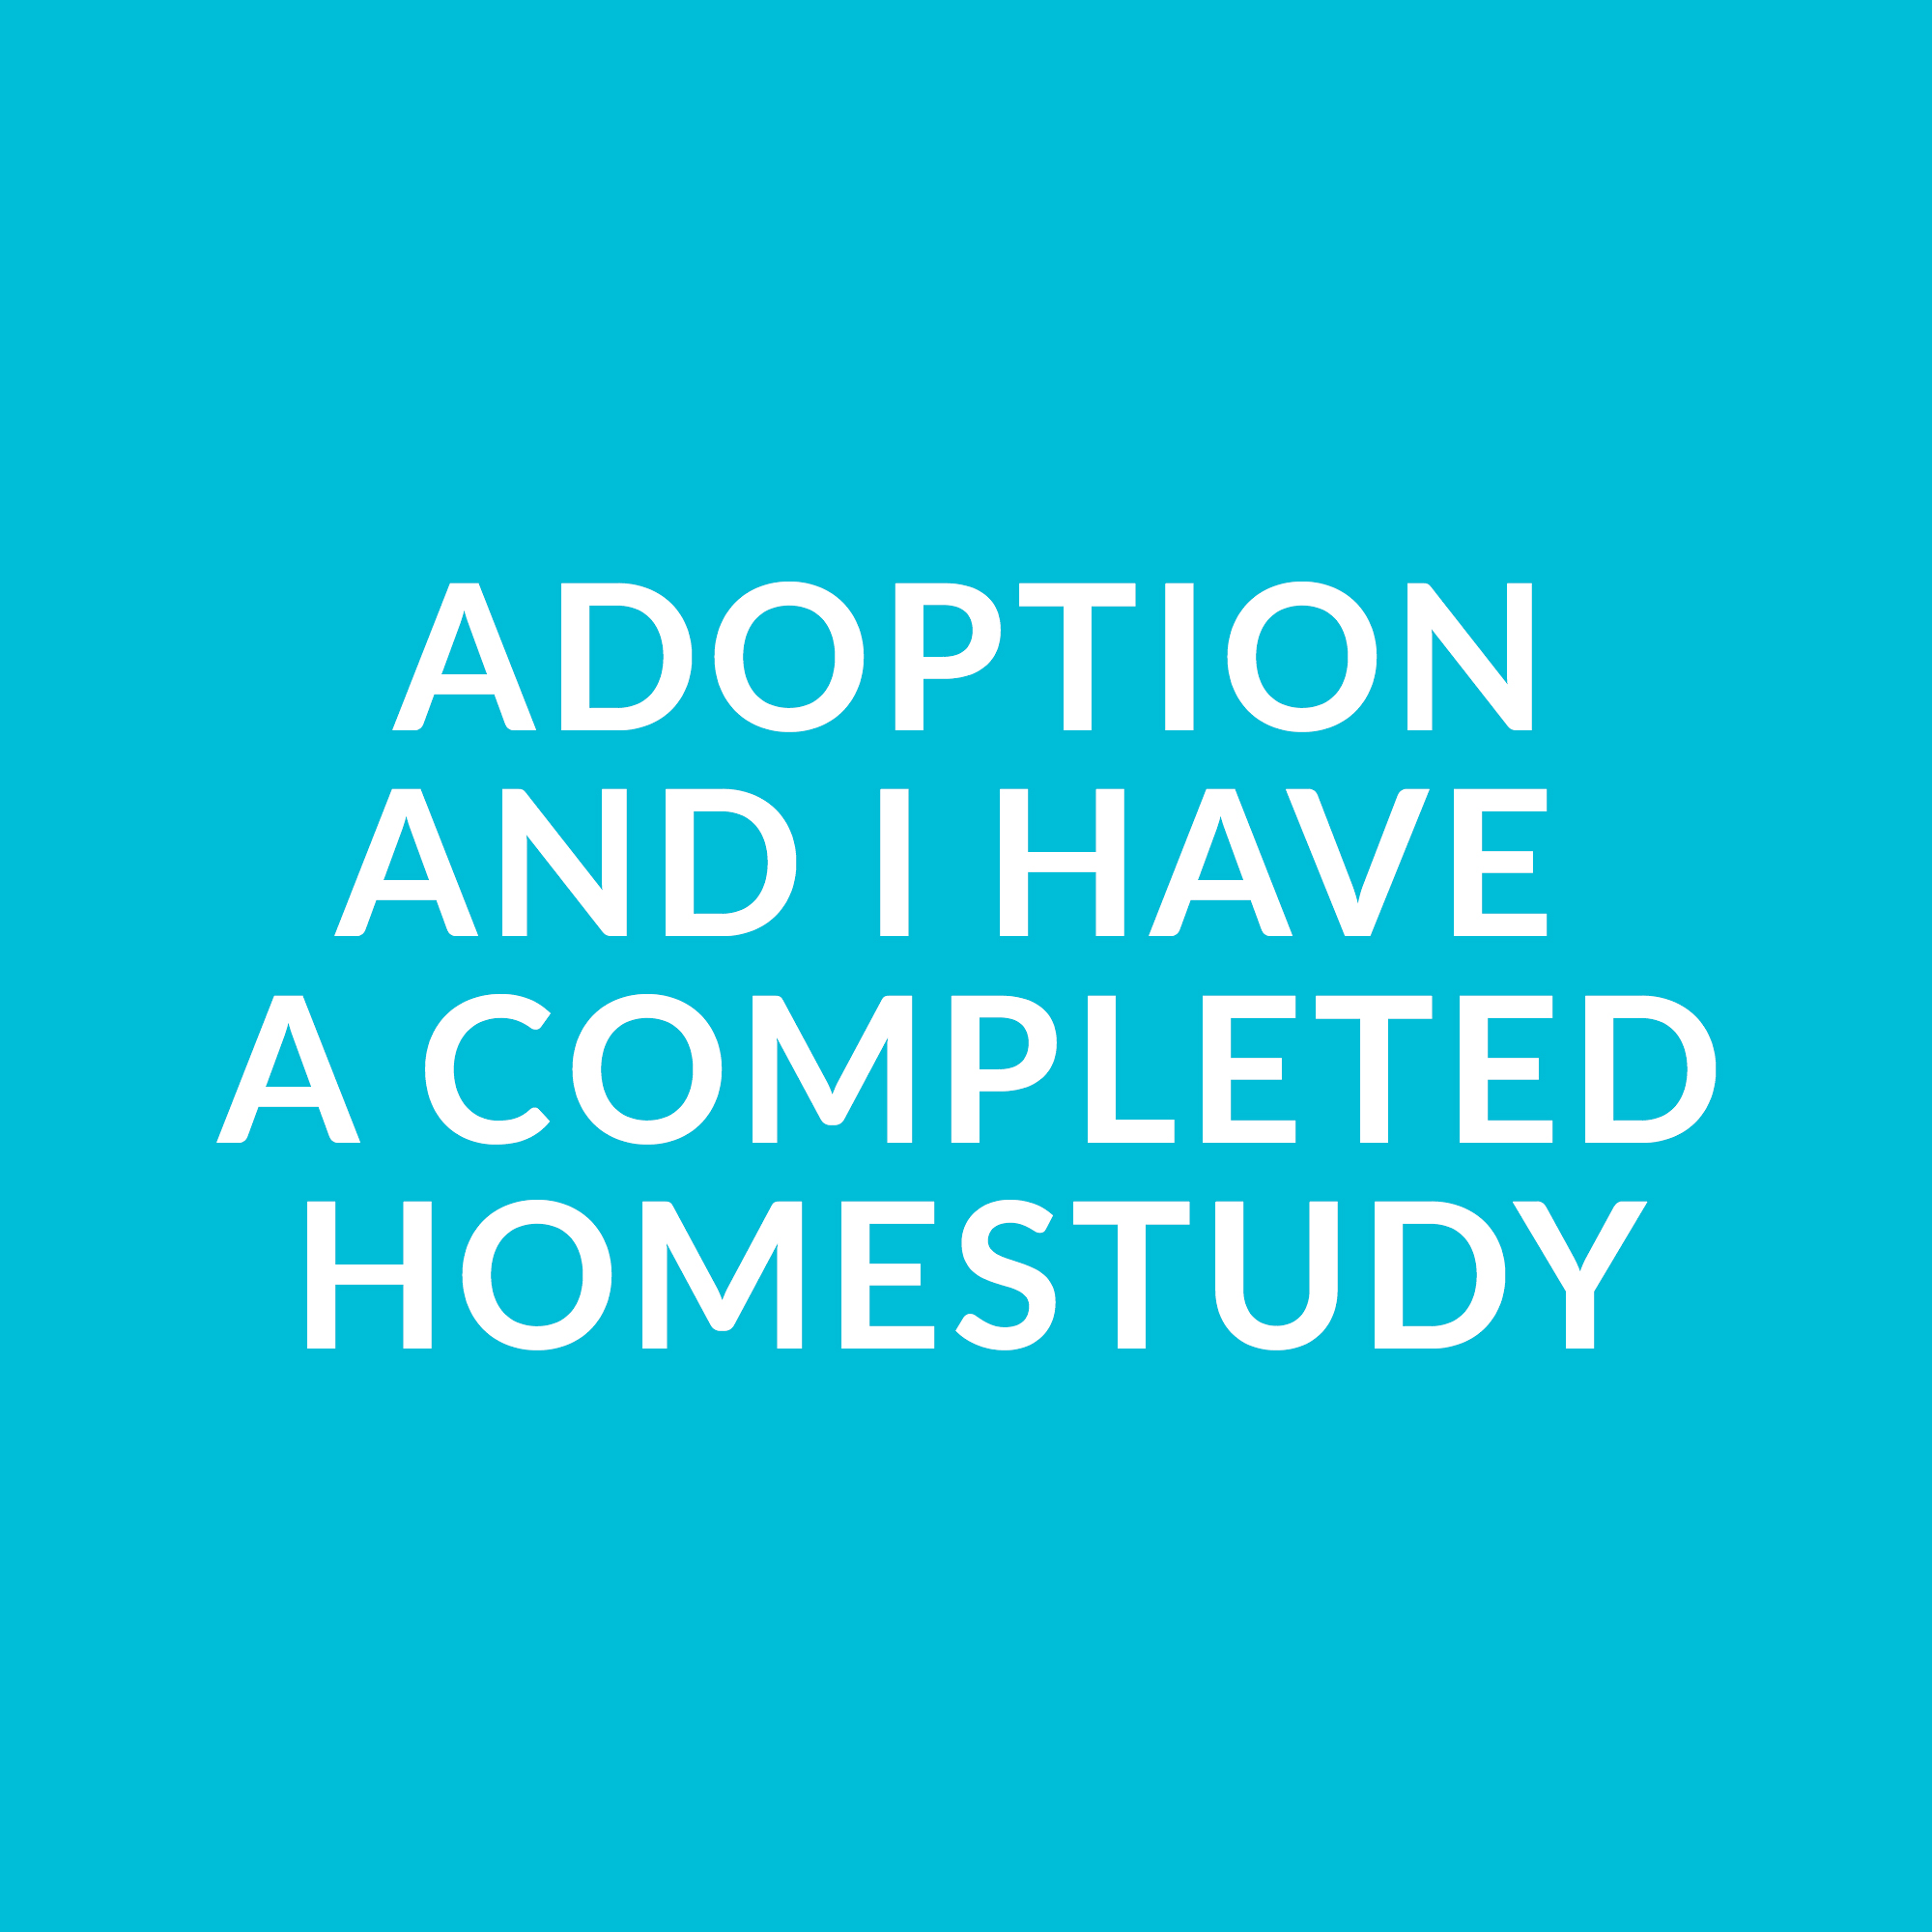 adoptionbuttons-homestudy.jpg